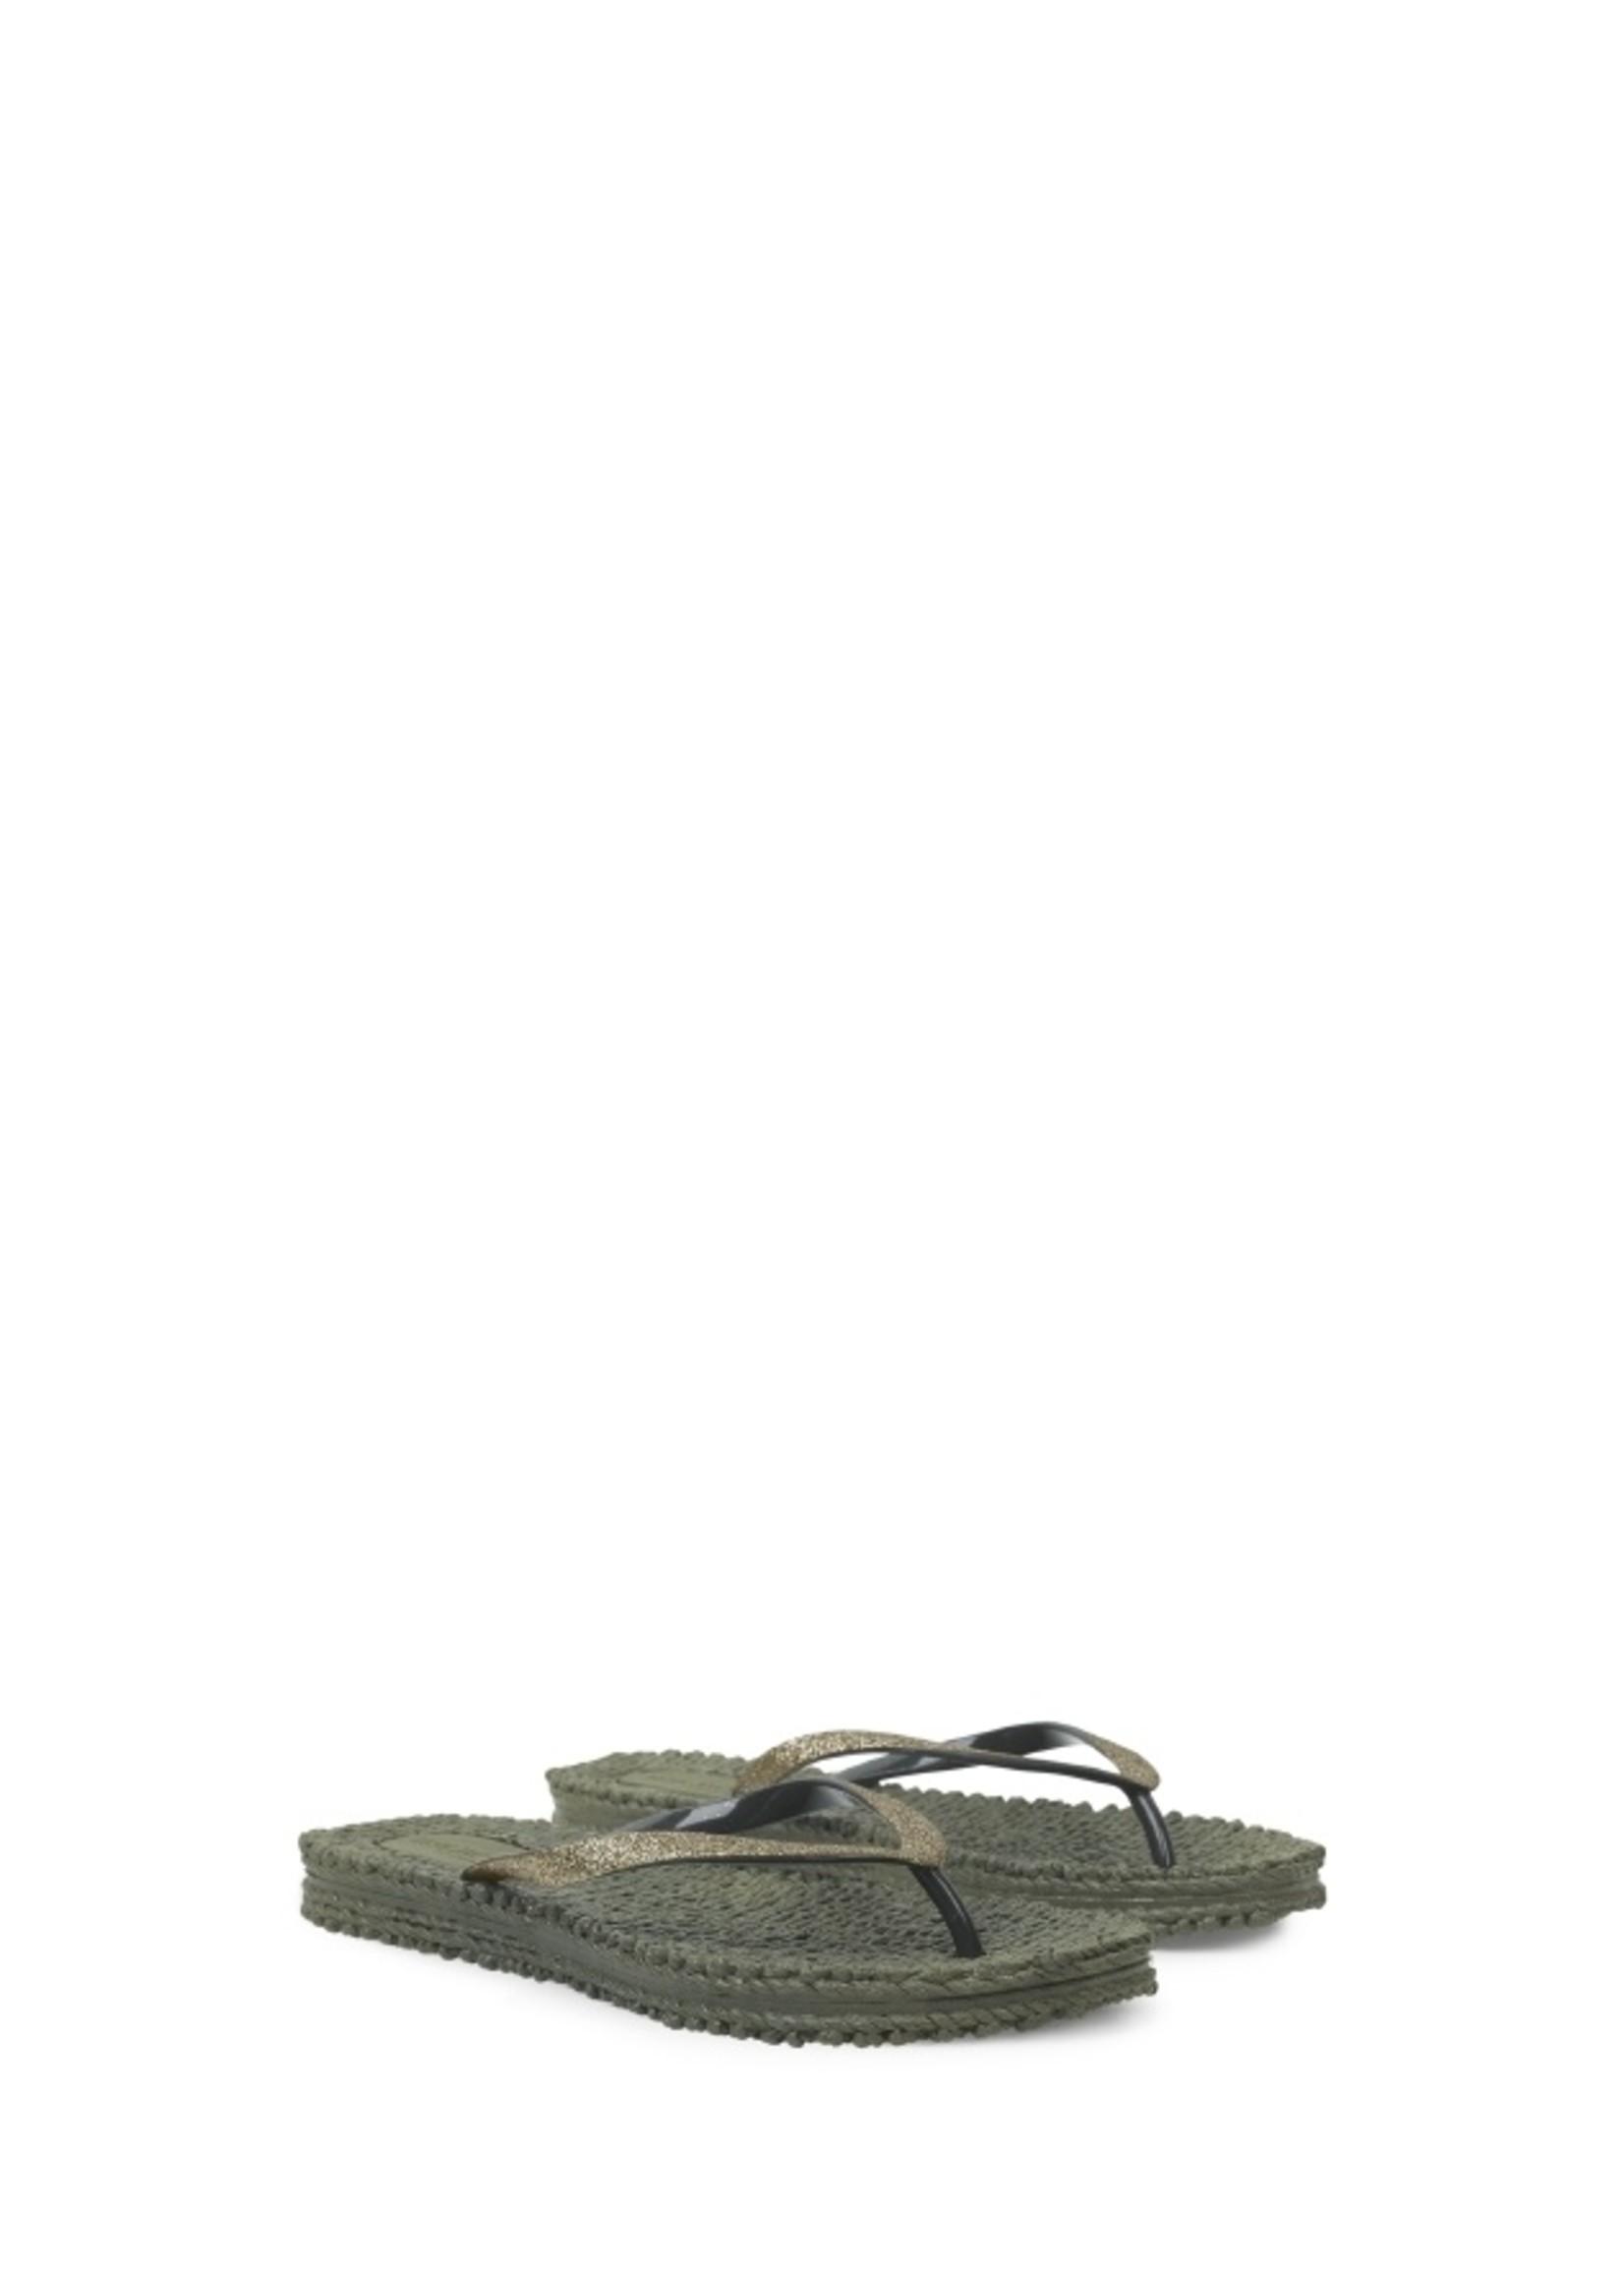 Ilse Jacobsen Cheerful Flip Flop - Army 36